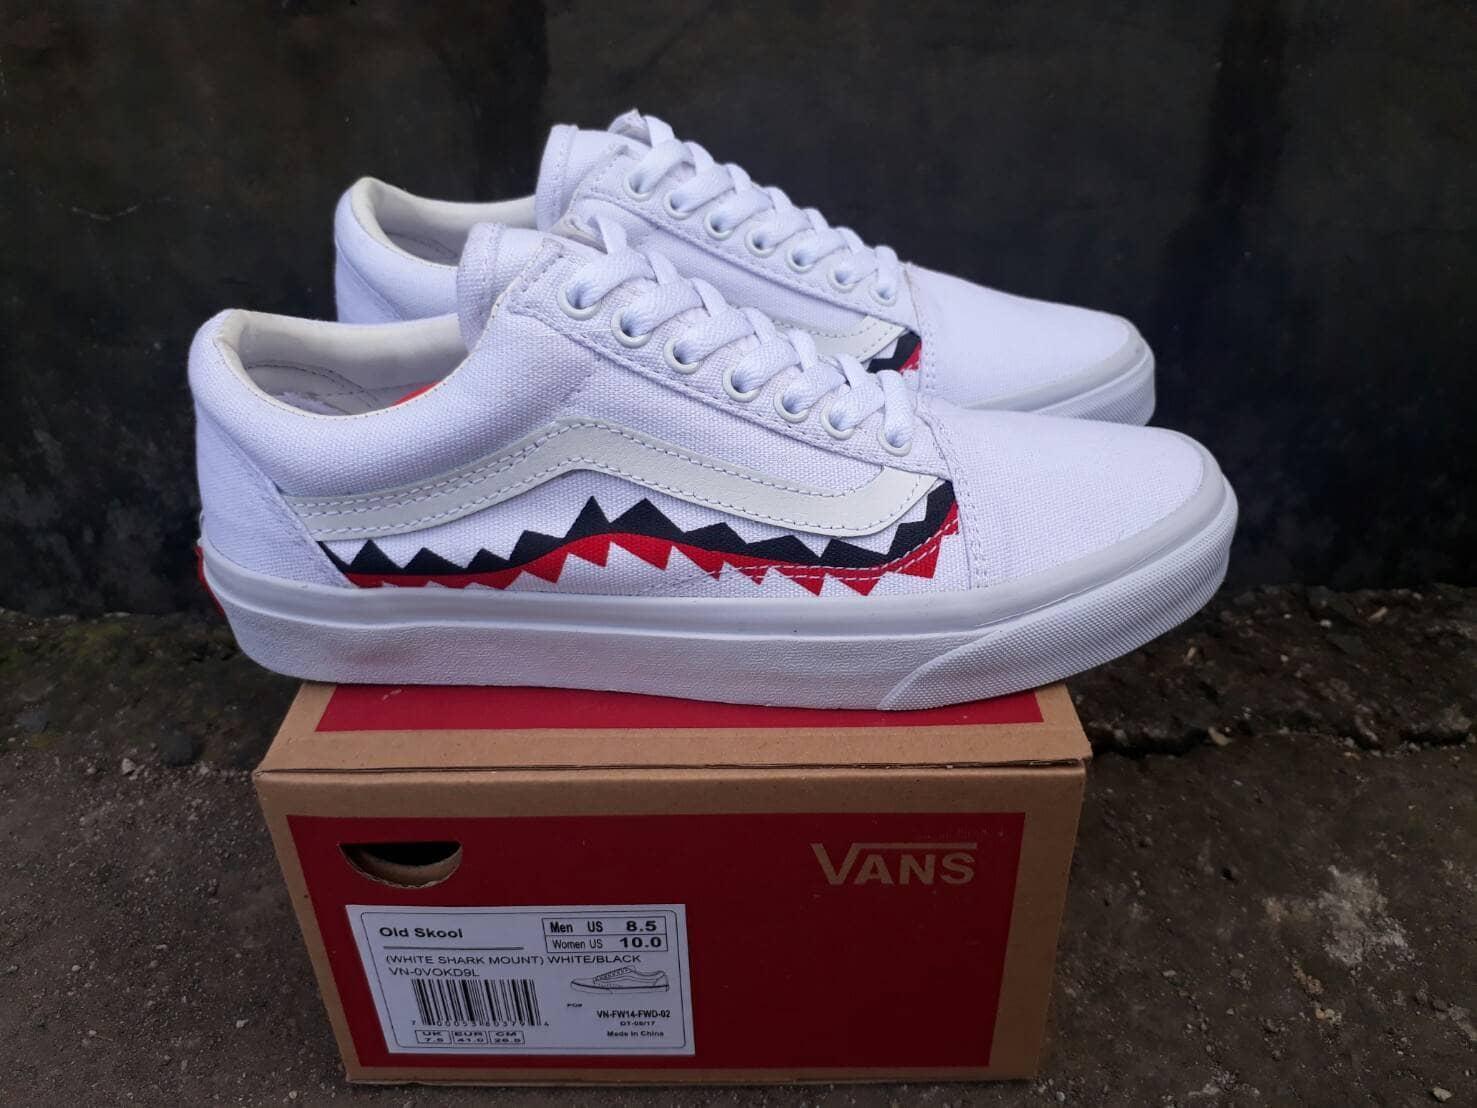 Daftar Harga Vans Old Skool Murah Sepatu Promo White Shark Mount Fashion